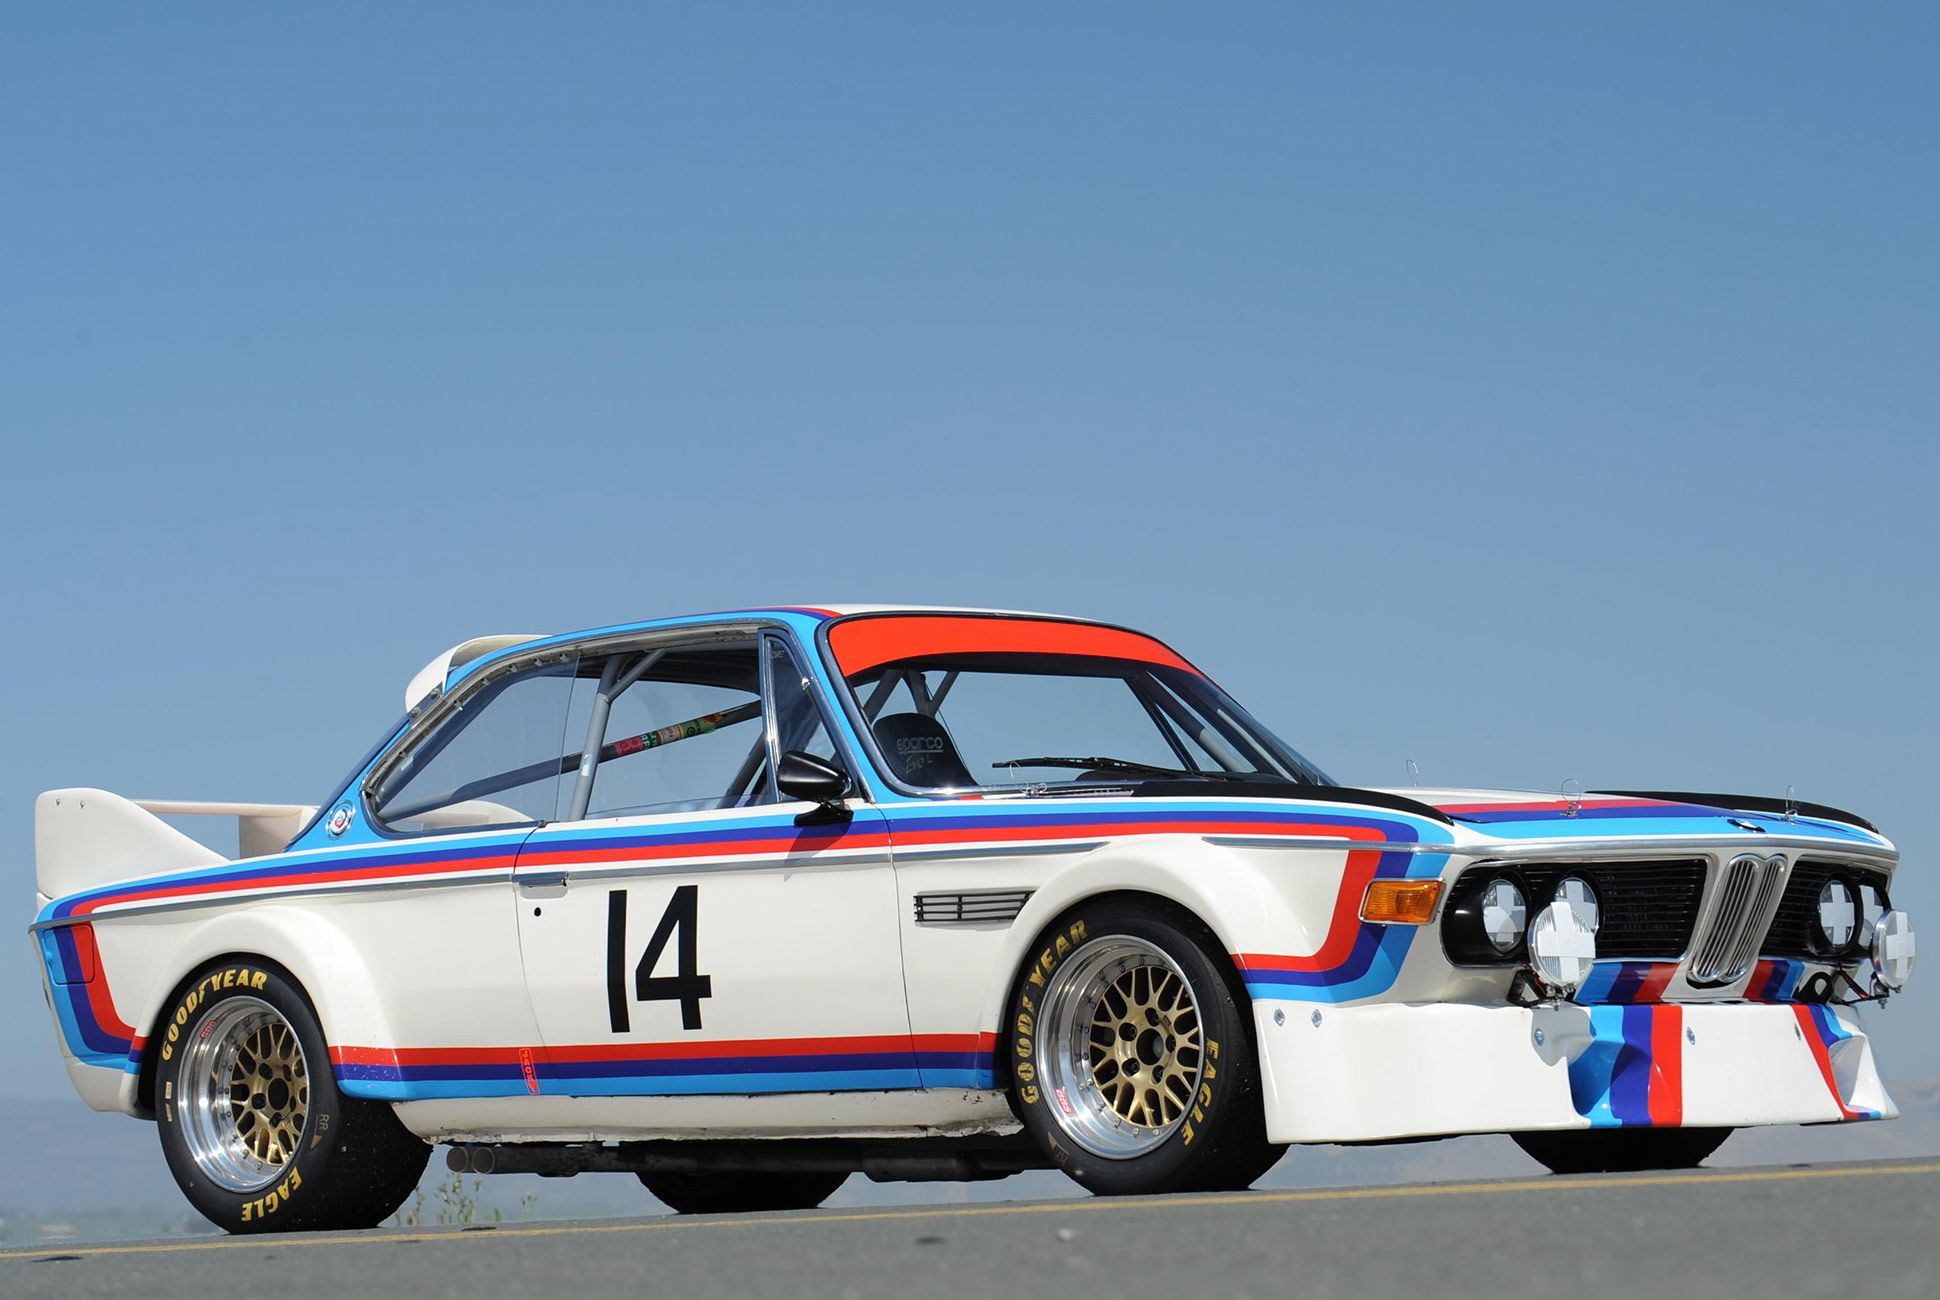 Bmwmotorsportbmwcsl Racing Cars Pinterest Bmw - 1975 bmw 3 0 csl